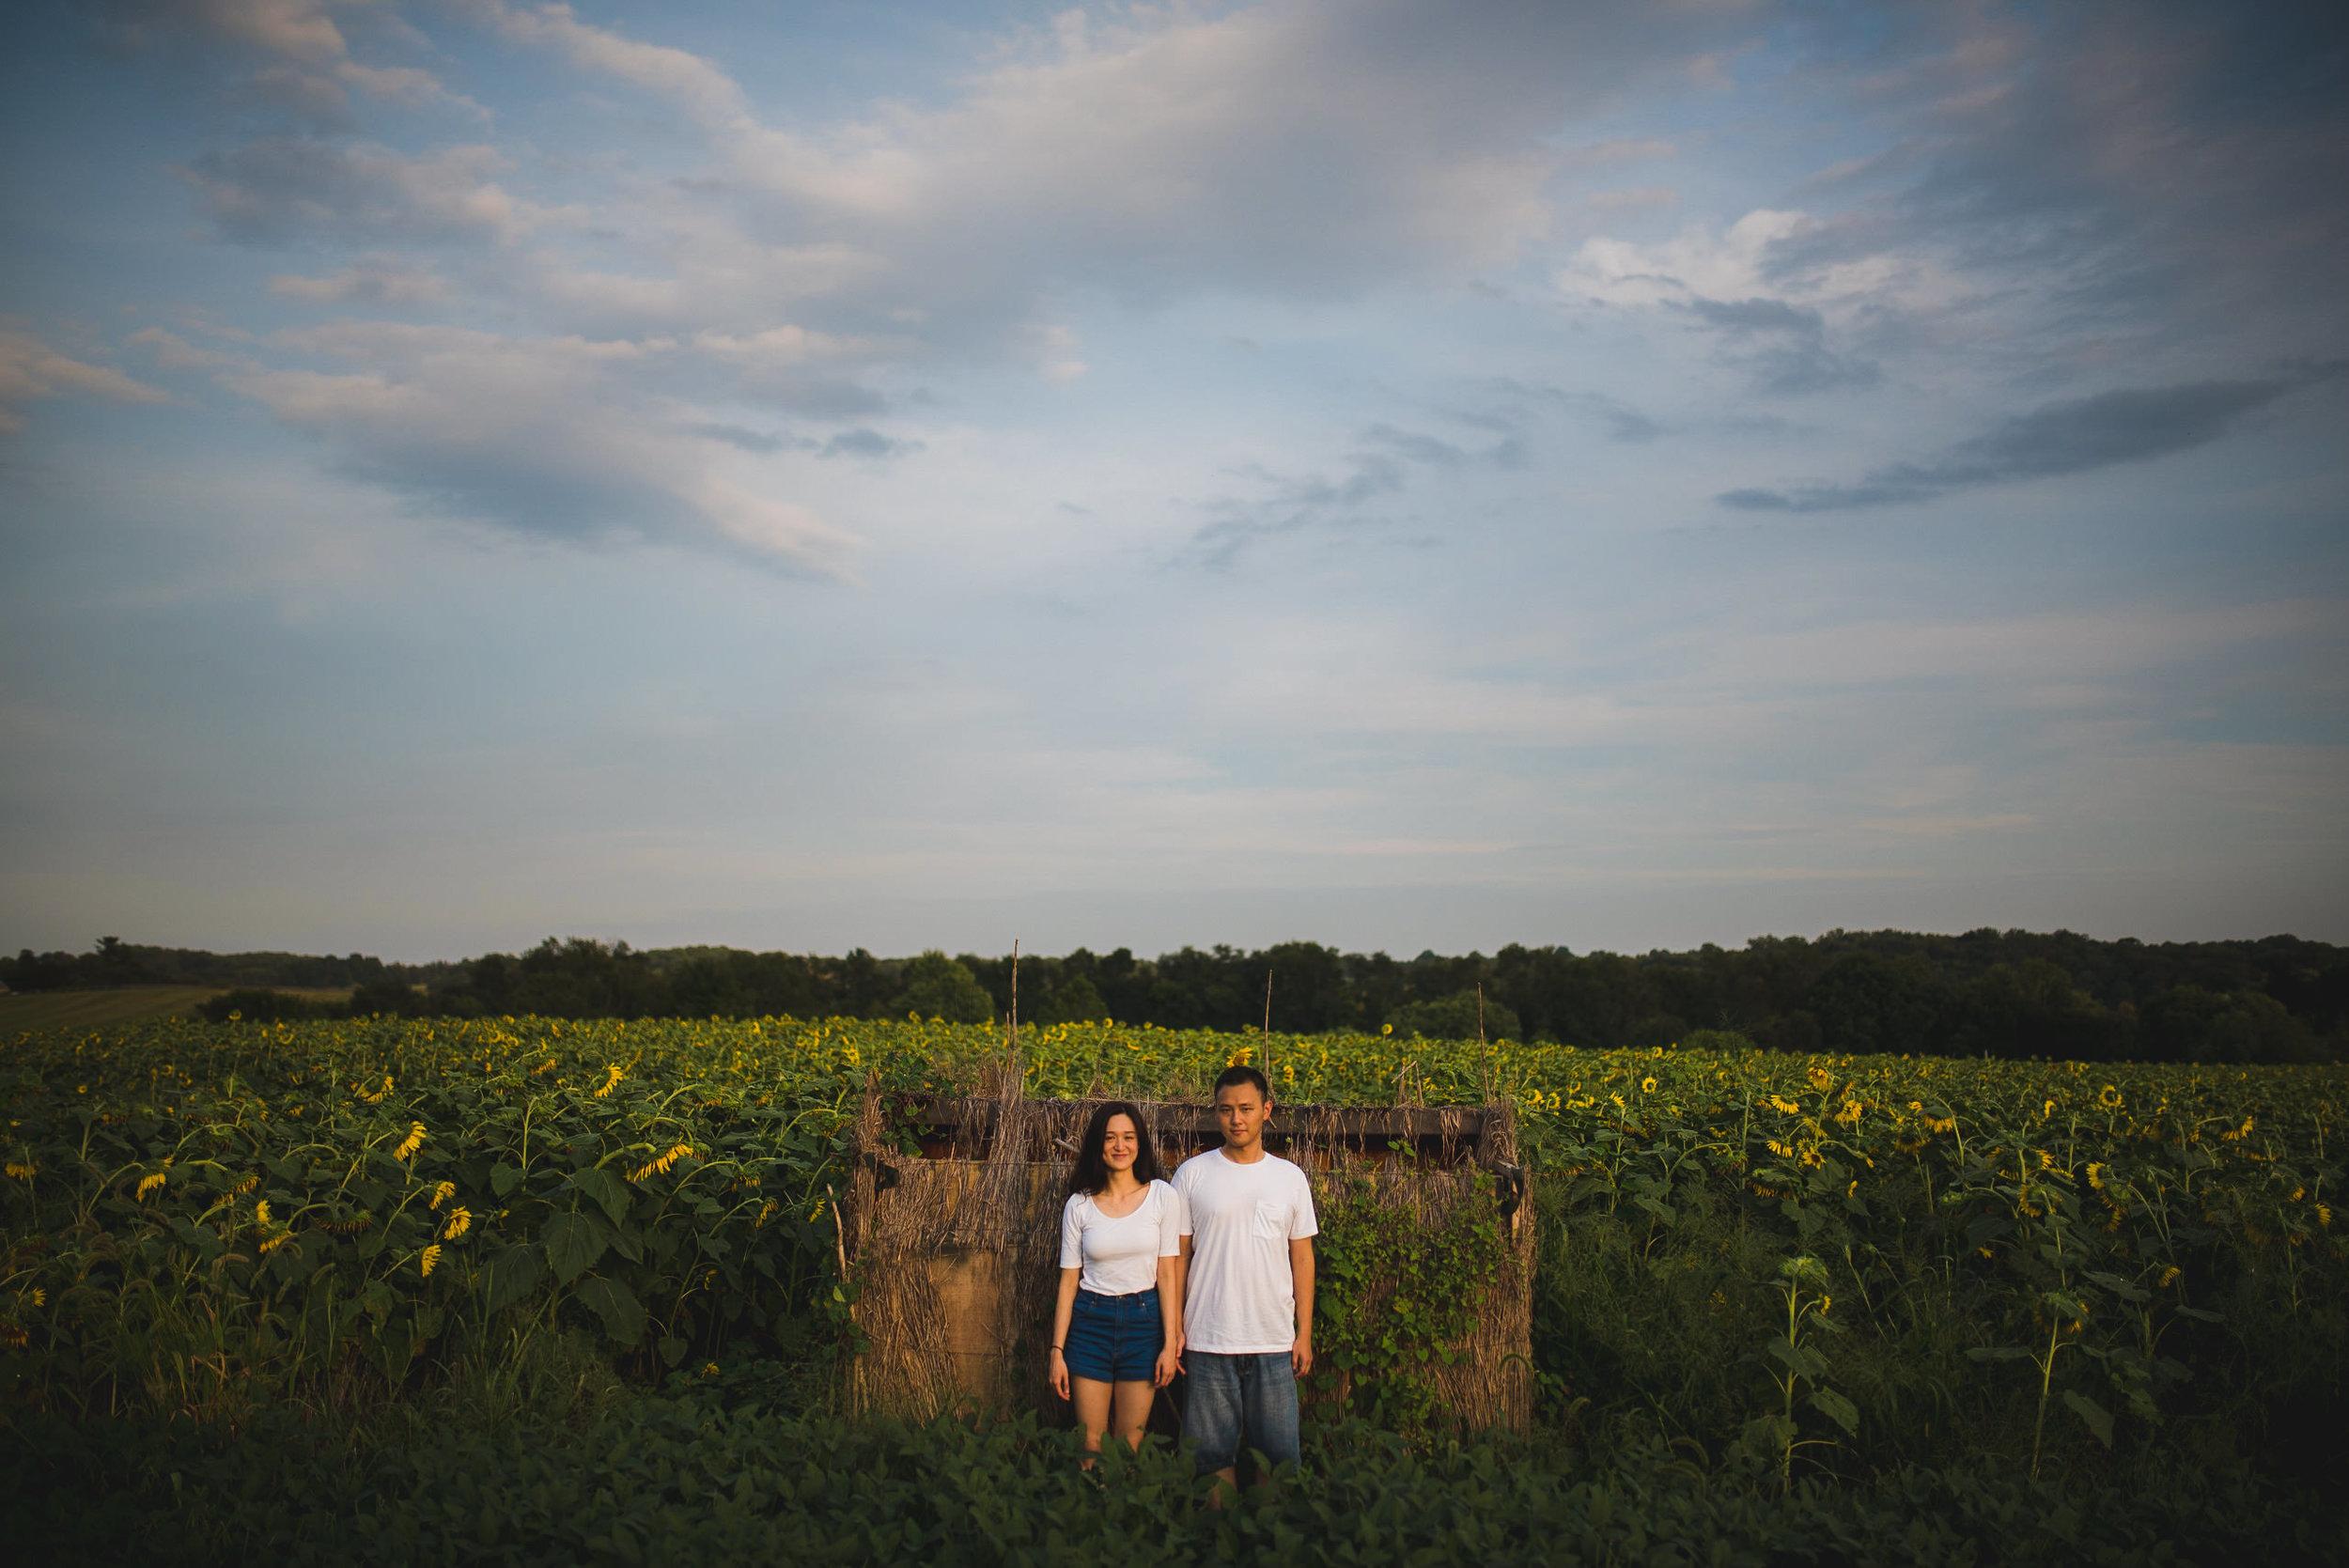 Sunflower Field Maryland Engagement Photographer Mantas Kubilinskas-7.jpg